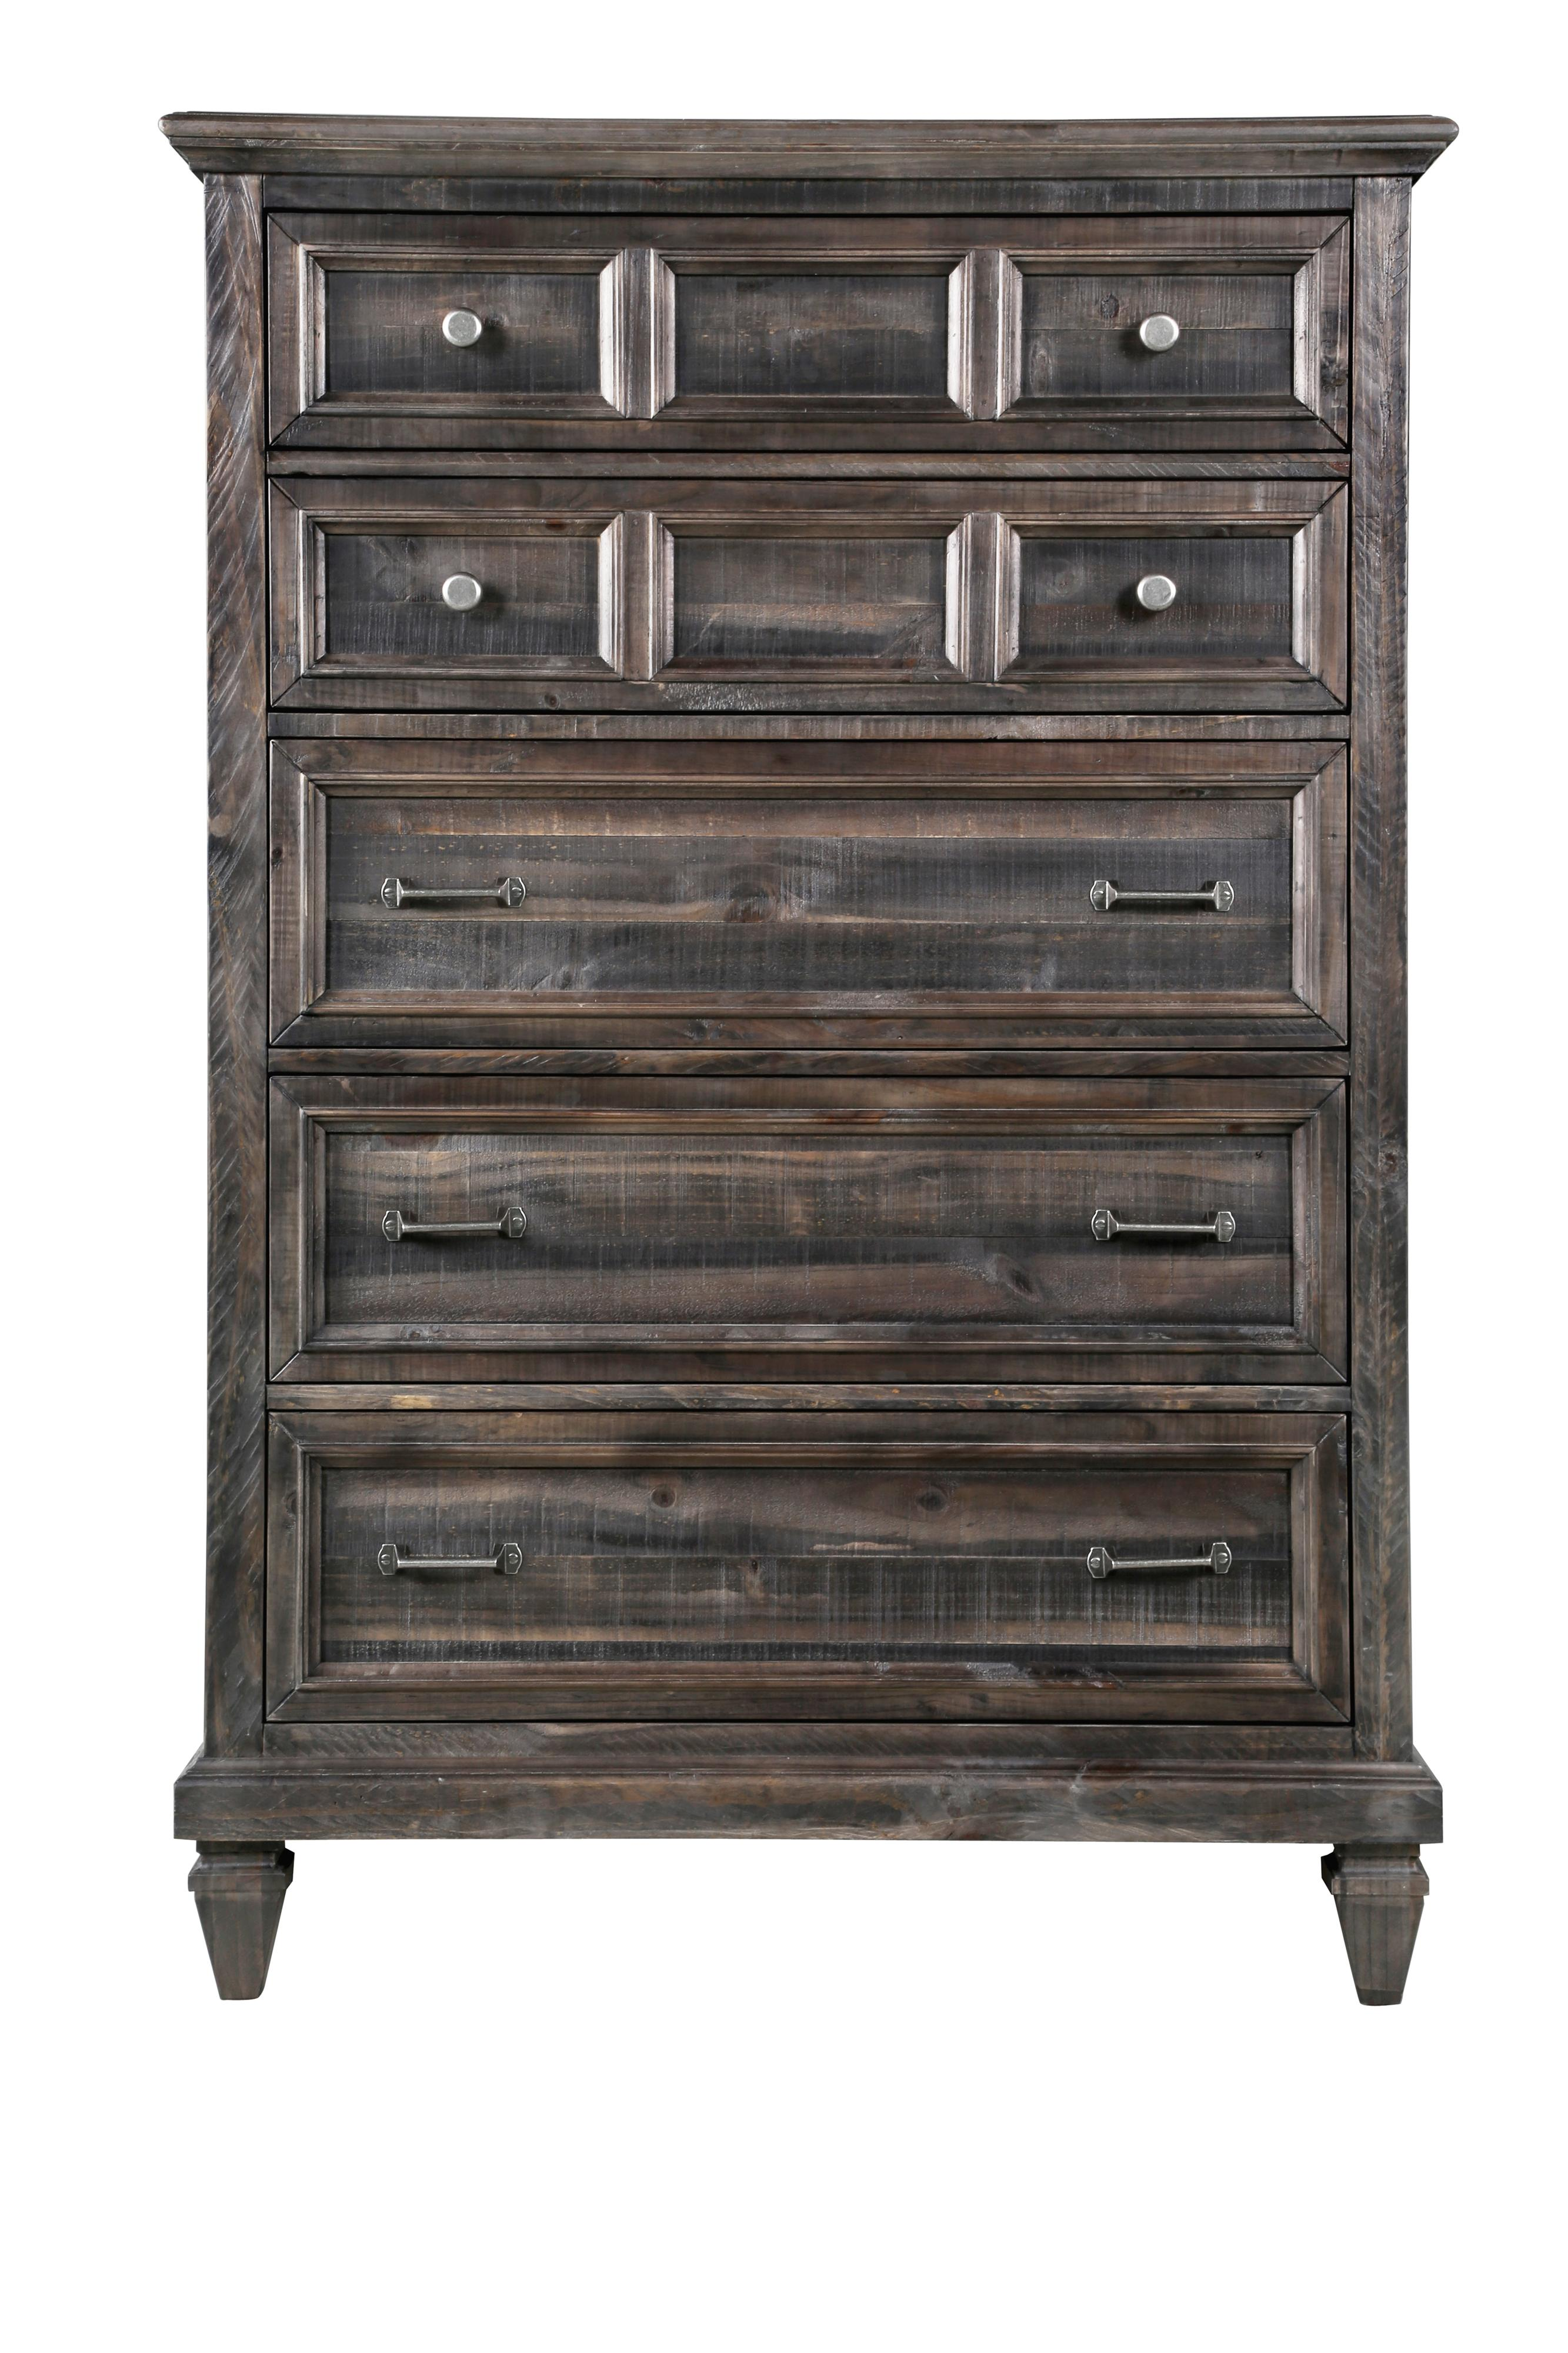 Benton Drawer Chest at Walker's Furniture